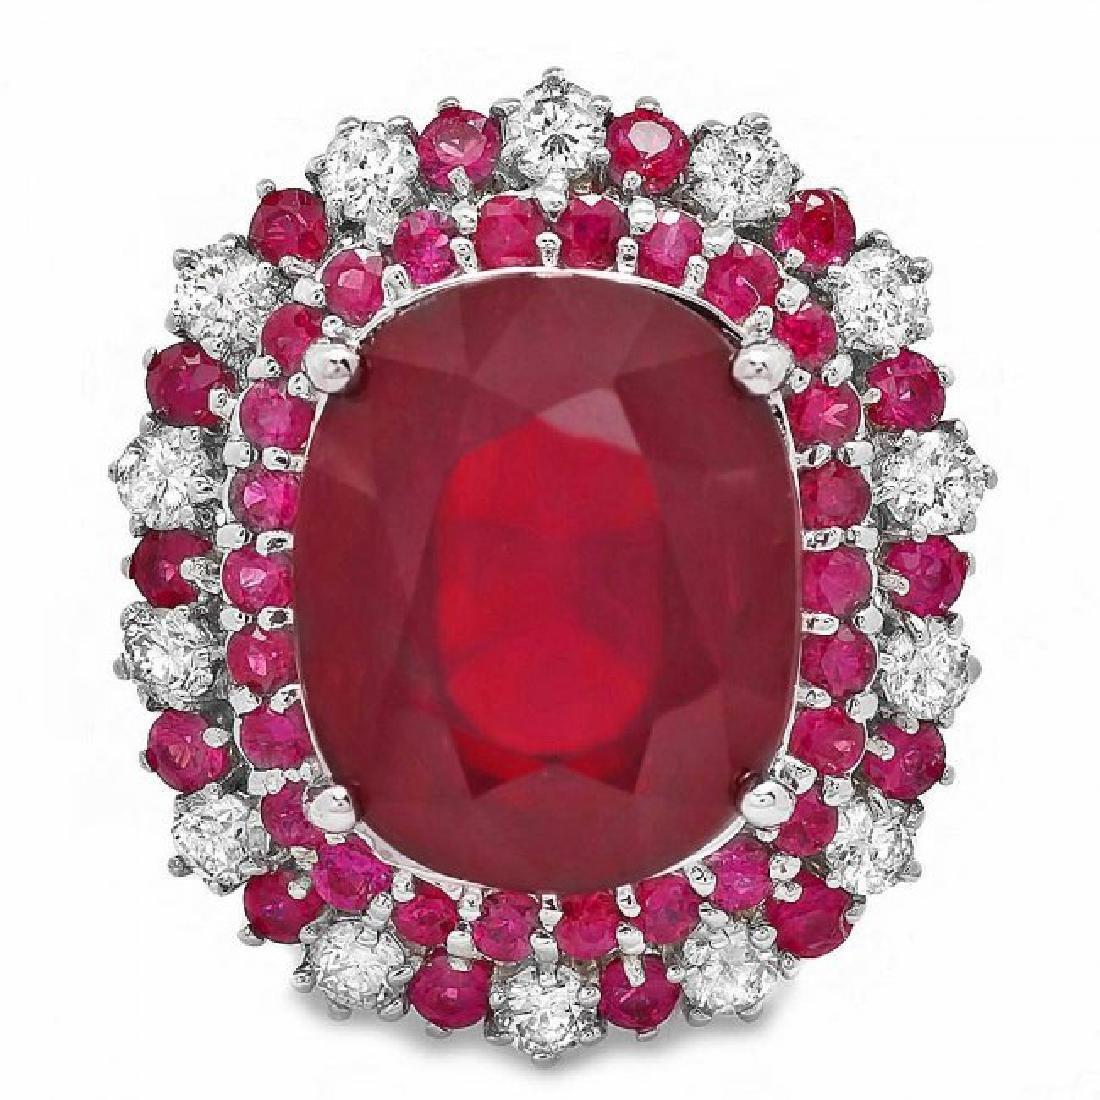 14k White Gold 17.5ct Ruby 0.88ct Diamond Ring - 2